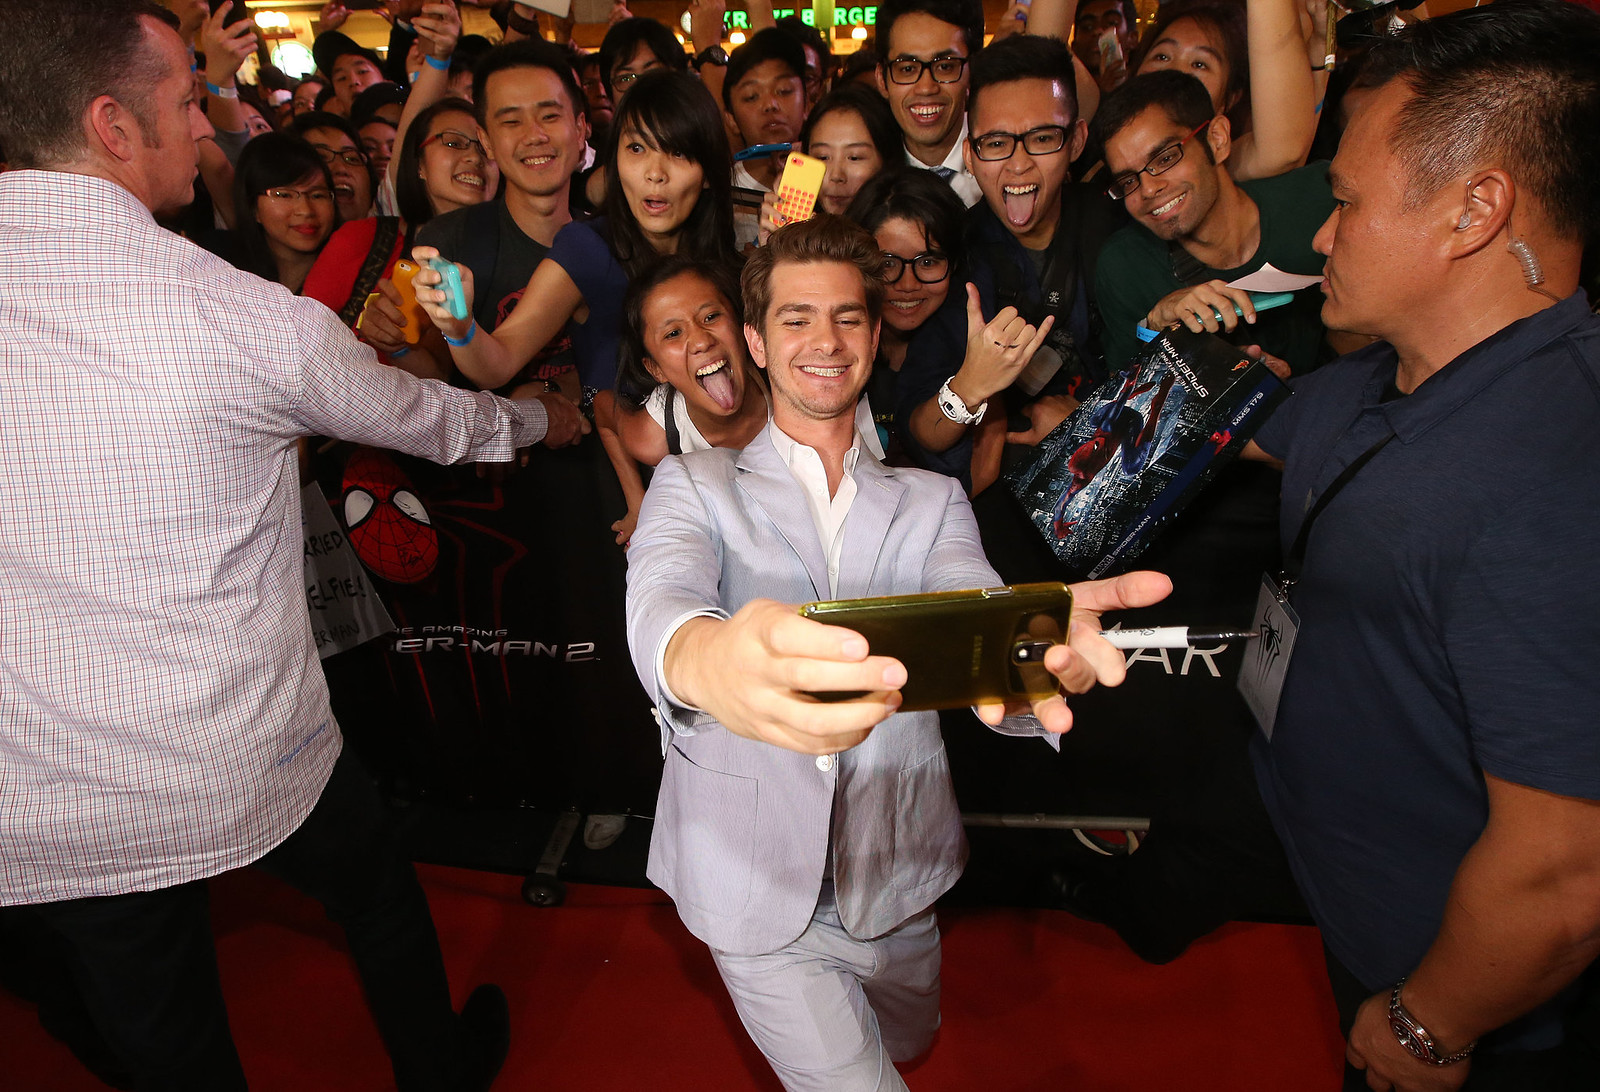 he-snapped-epic-selfie-fans